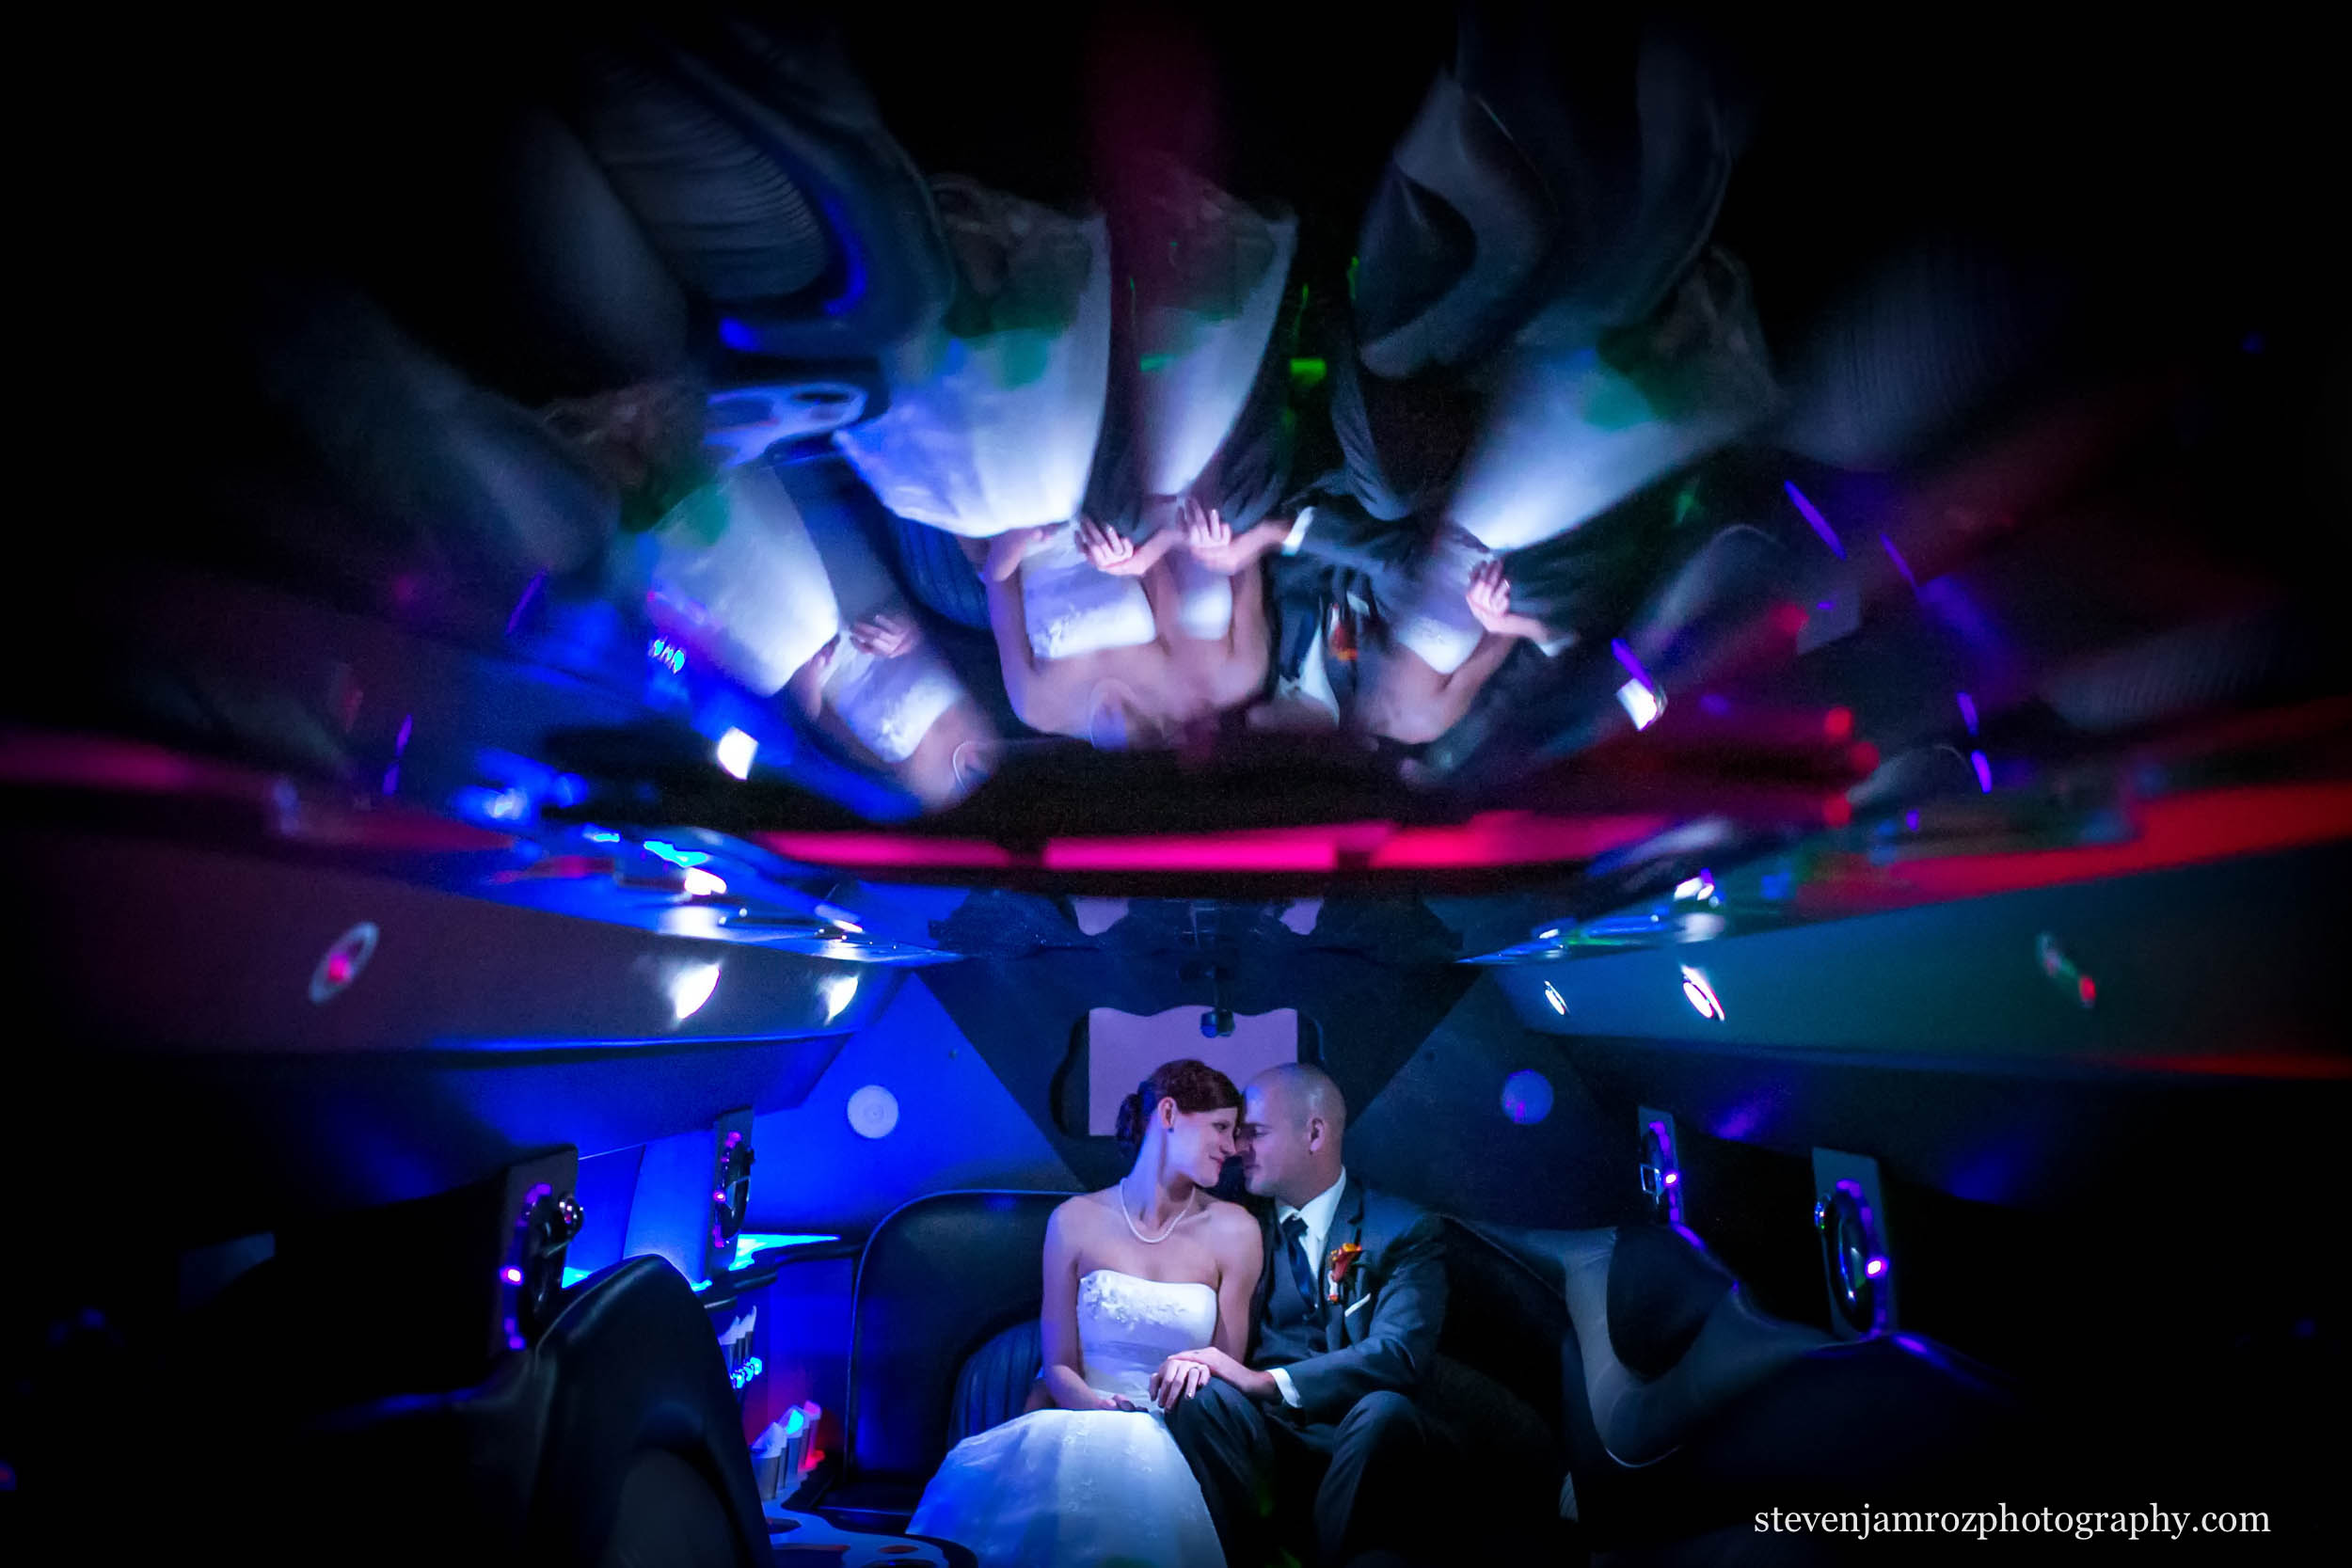 limo-louisburg-nc-hudson-manor-wedding-steven-jamroz-photography-0469.jpg